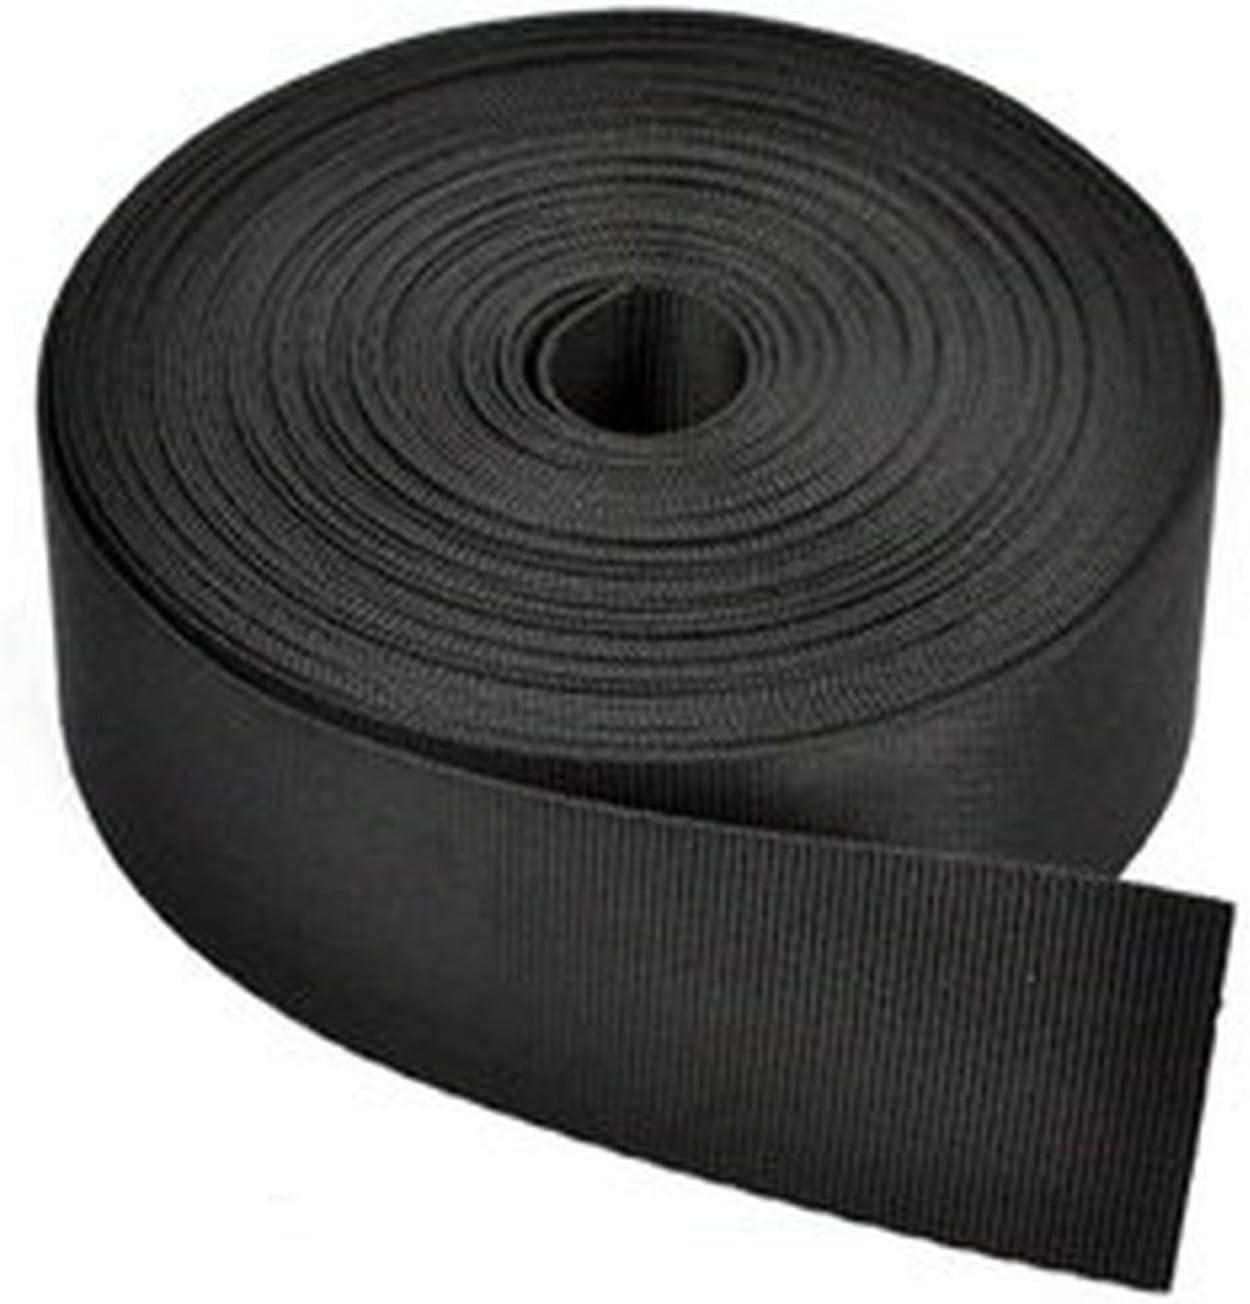 RETON 10 Yards Black Nylon Heavy Webbing 2 1 In Strap Polypro Ranking High material TOP7